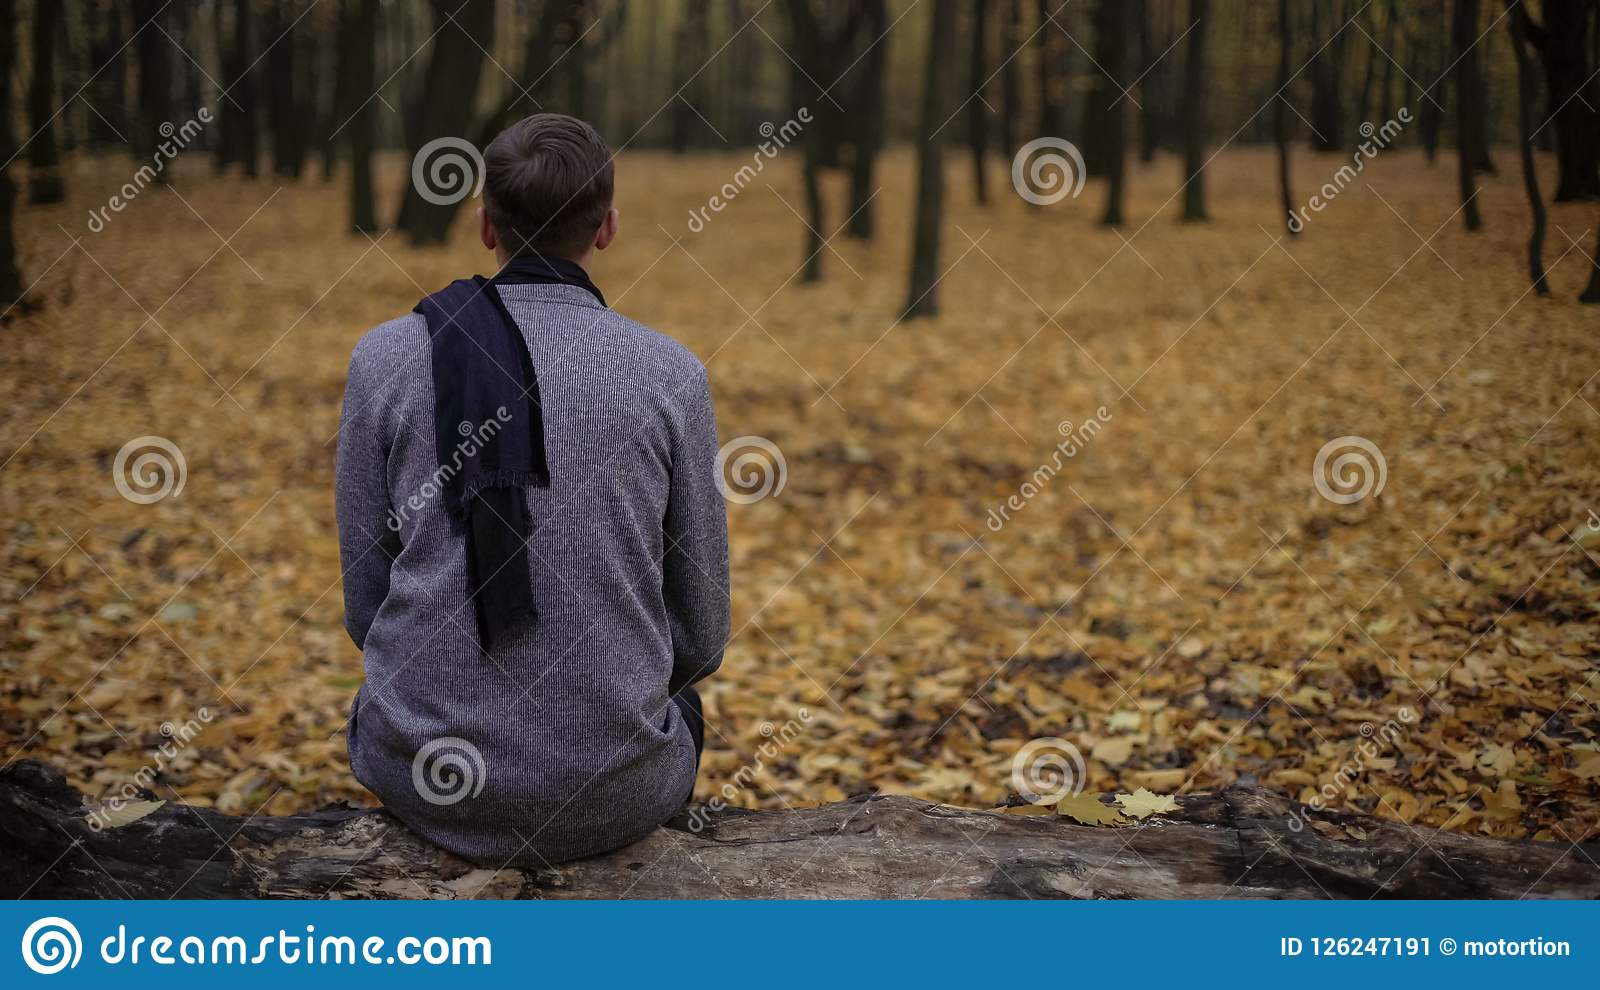 Man sitting in park alone, gray tones express depression, sadness, melancholy